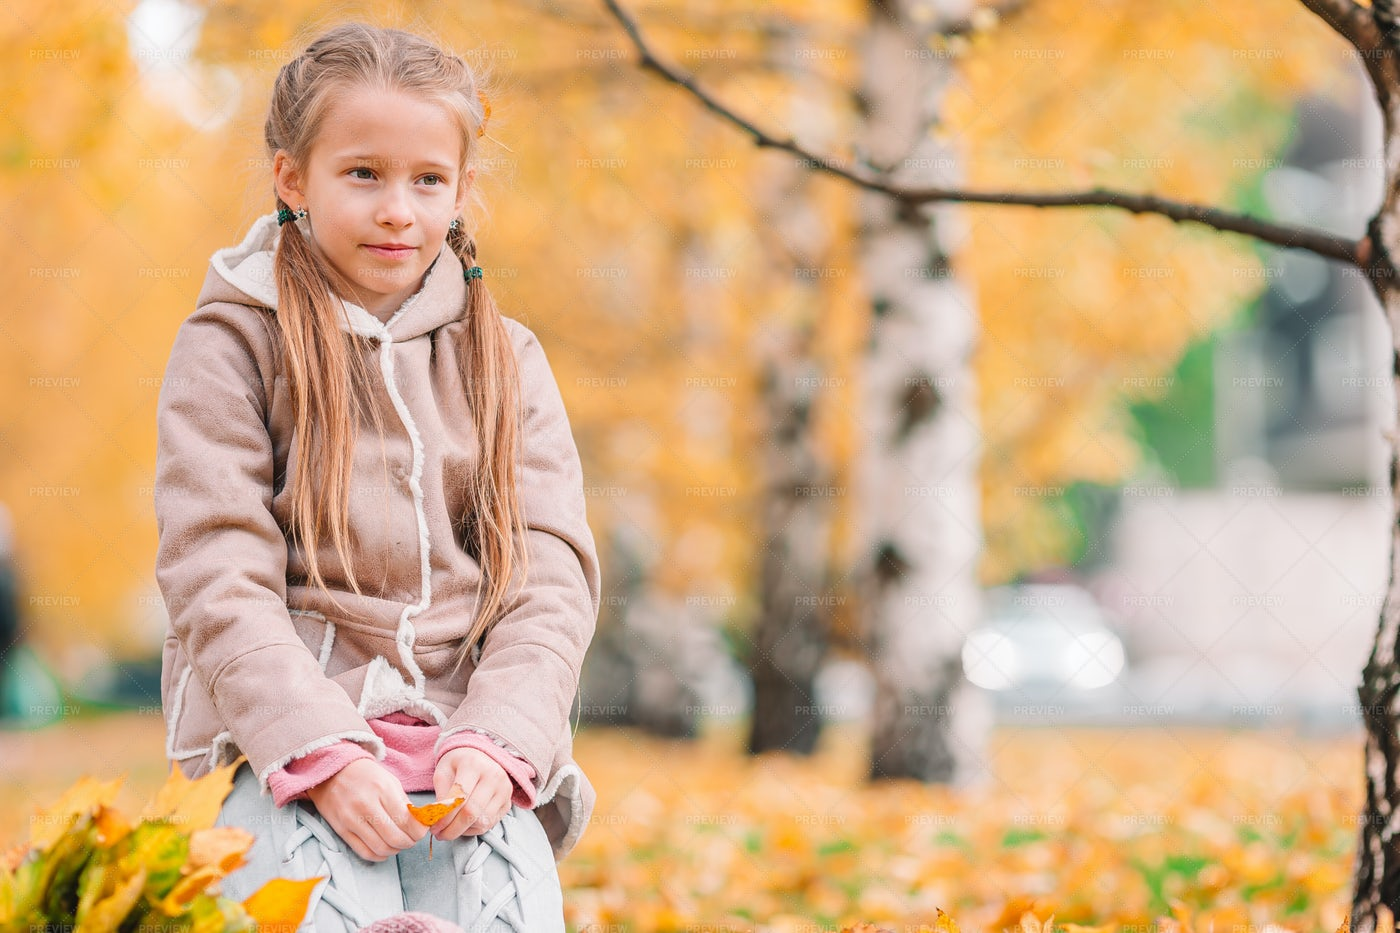 Litttle Girl In An Autumn Park: Stock Photos